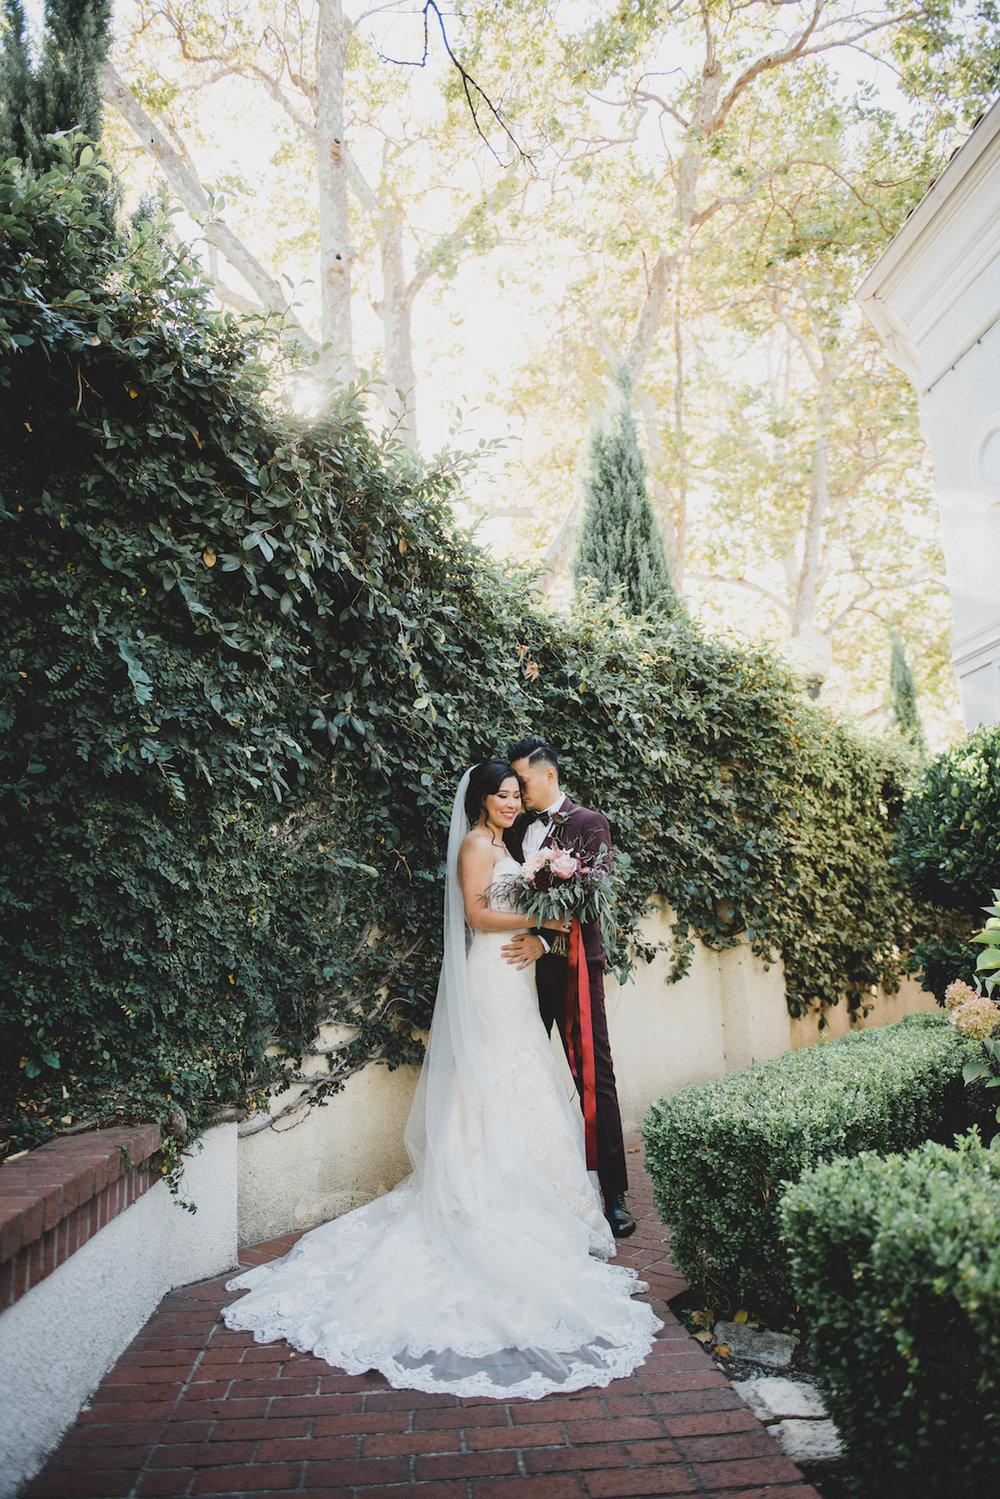 THE DETAILS - DRESS: ALLURE BRIDALSPHOTOGRAPHER: LIZ ZIMBELMAN PHOTOGRAPHYVENUE: VIZCAYA